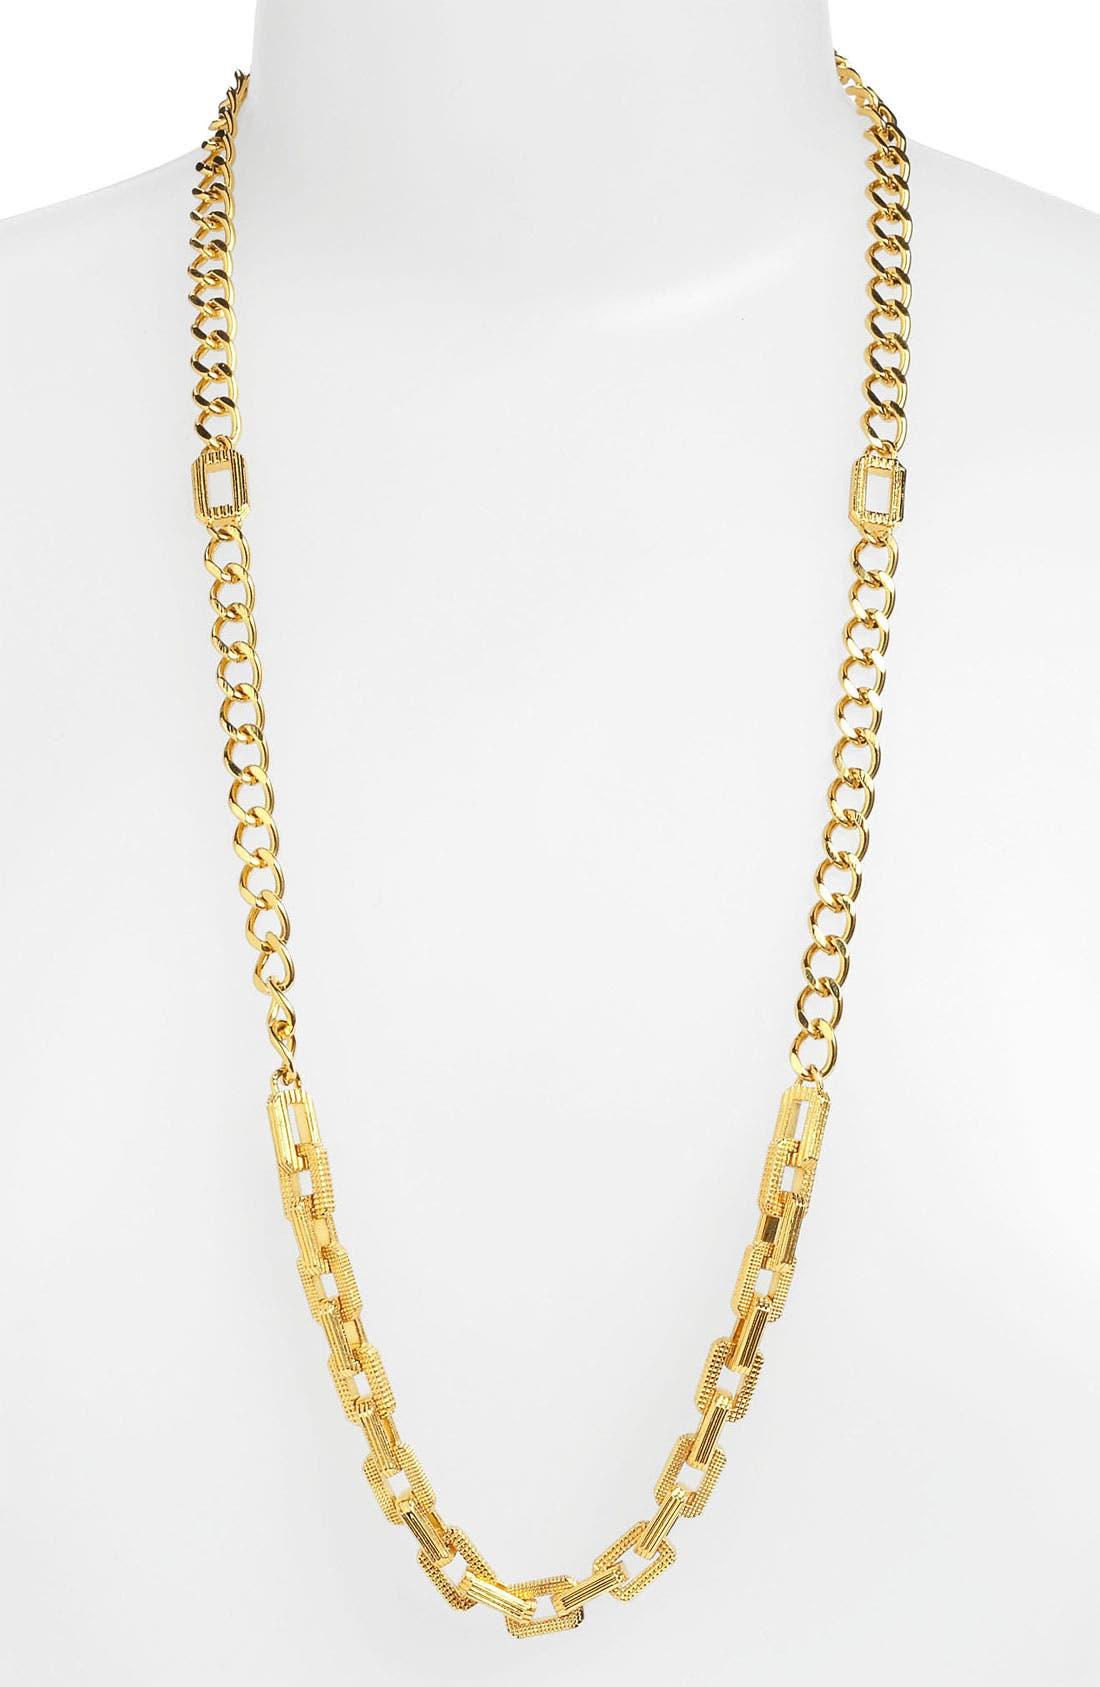 Alternate Image 1 Selected - Eddie Borgo 'Supra Link' Necklace